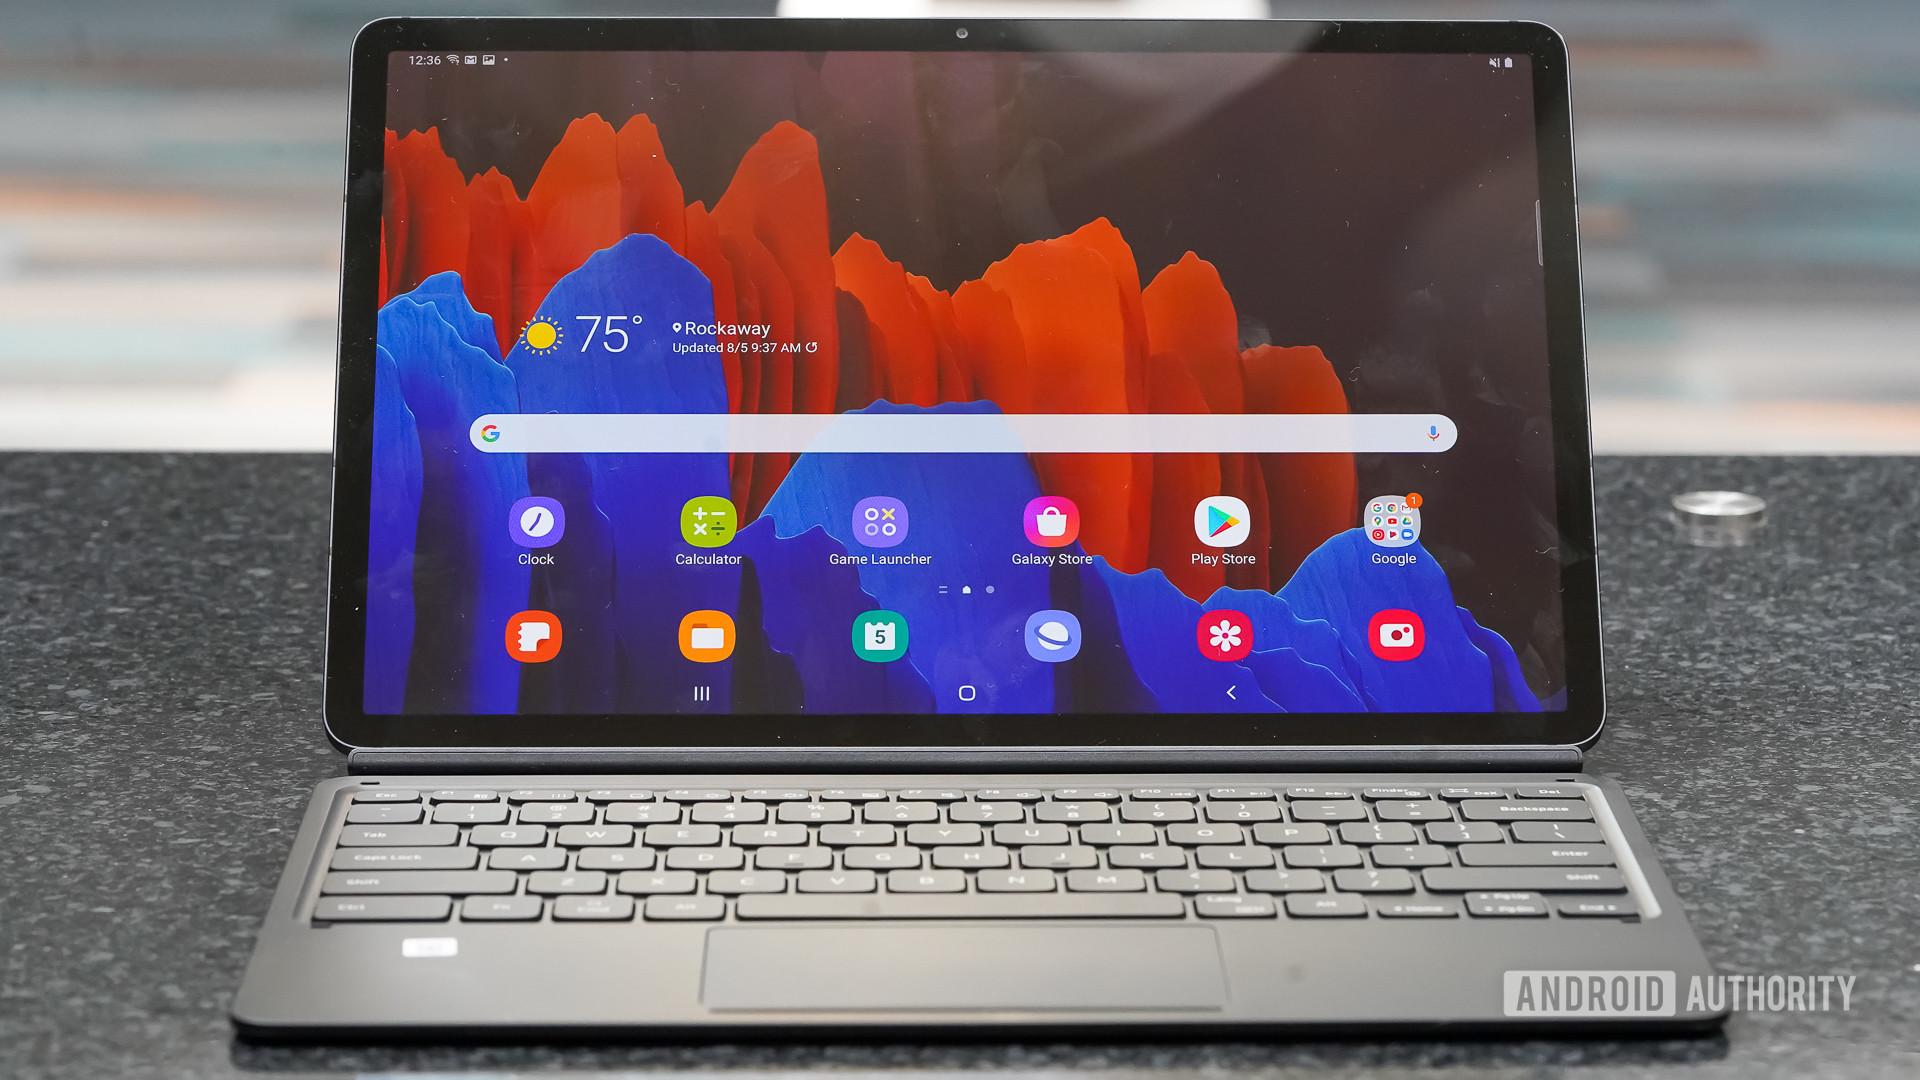 Samsung Galaxy Tab S7 Plus front profile